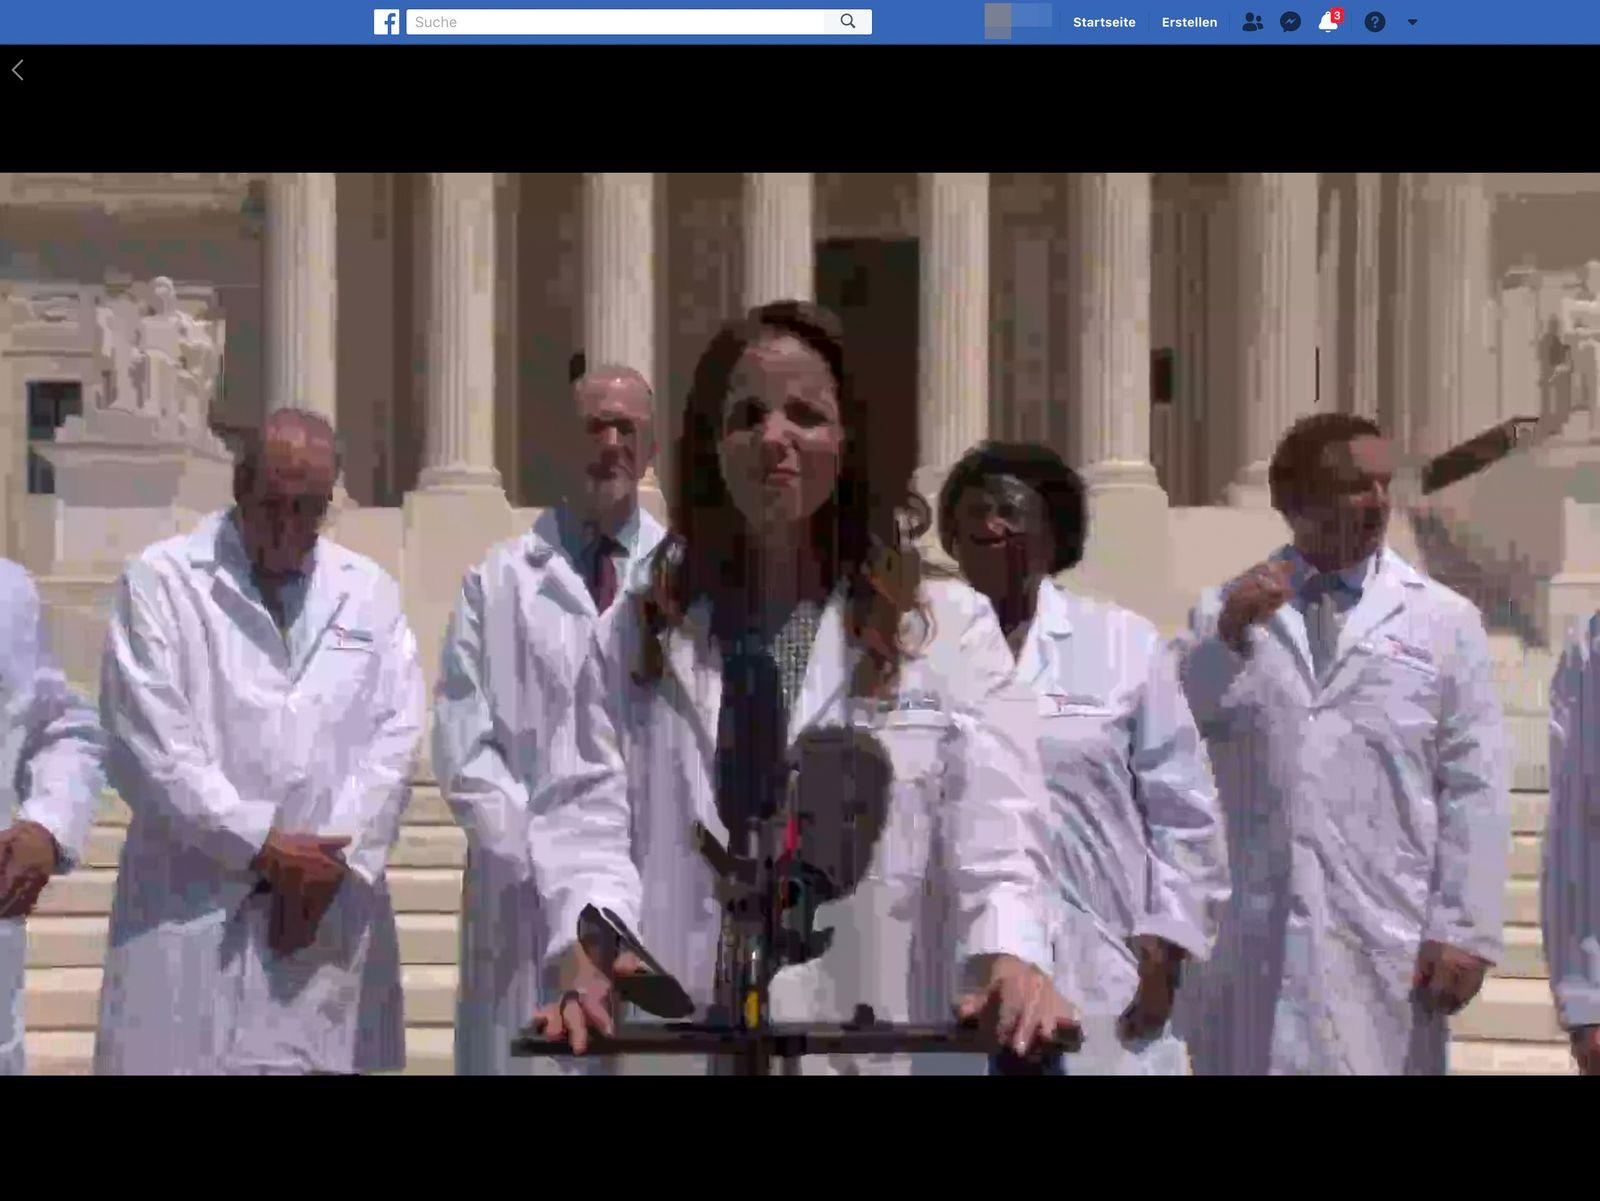 Press Conference - Americas Frontline Doctors SCREENSHOT